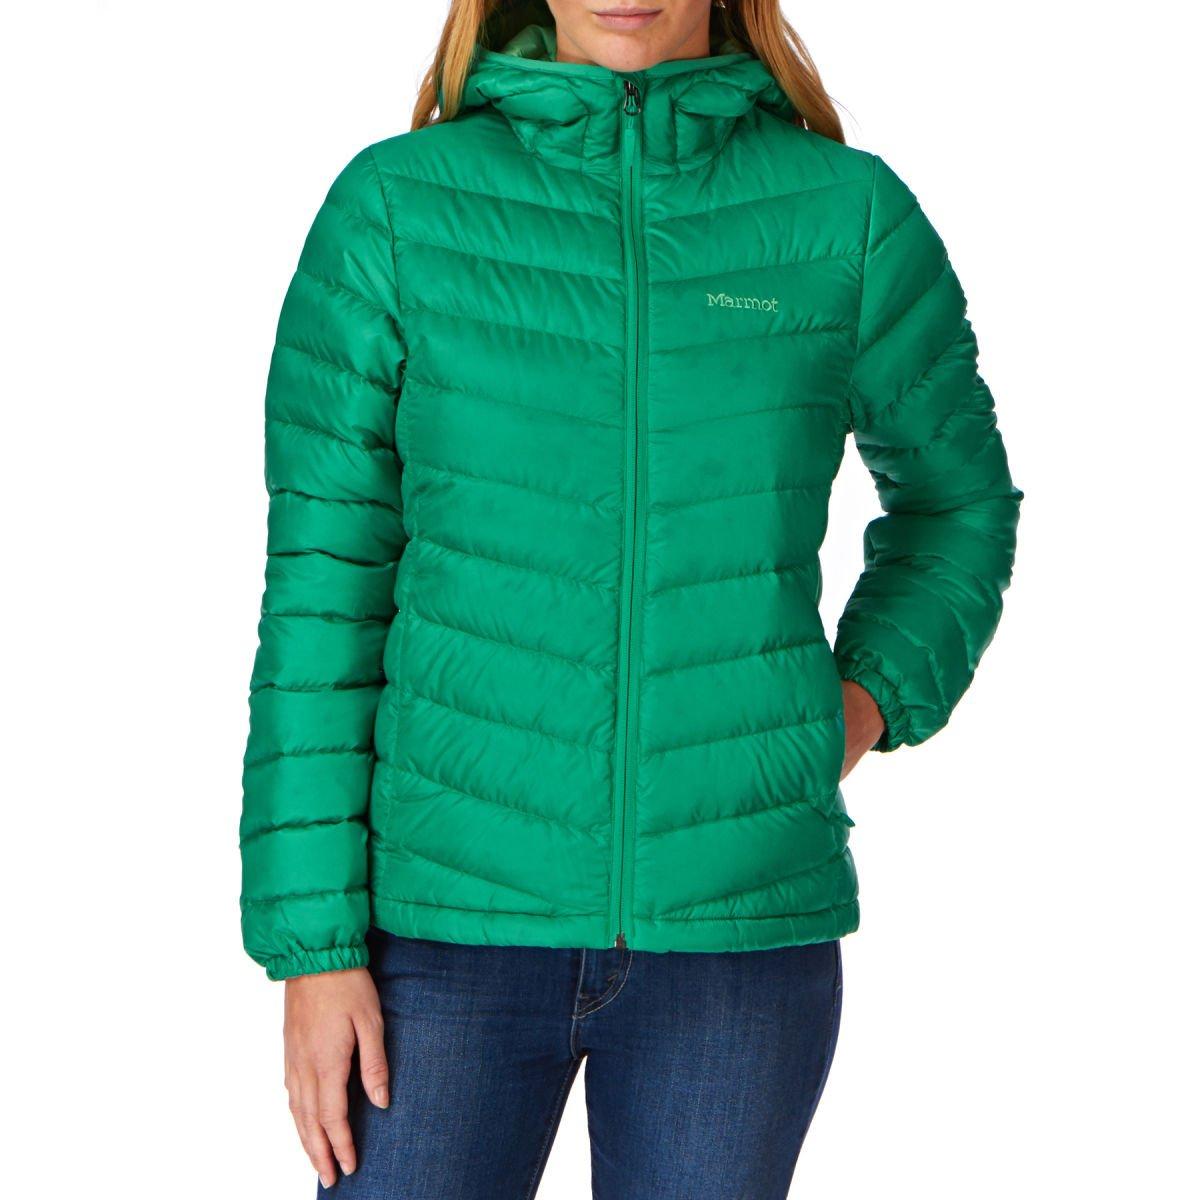 Marmot Damen Kapuzenjacke Jena kaufen